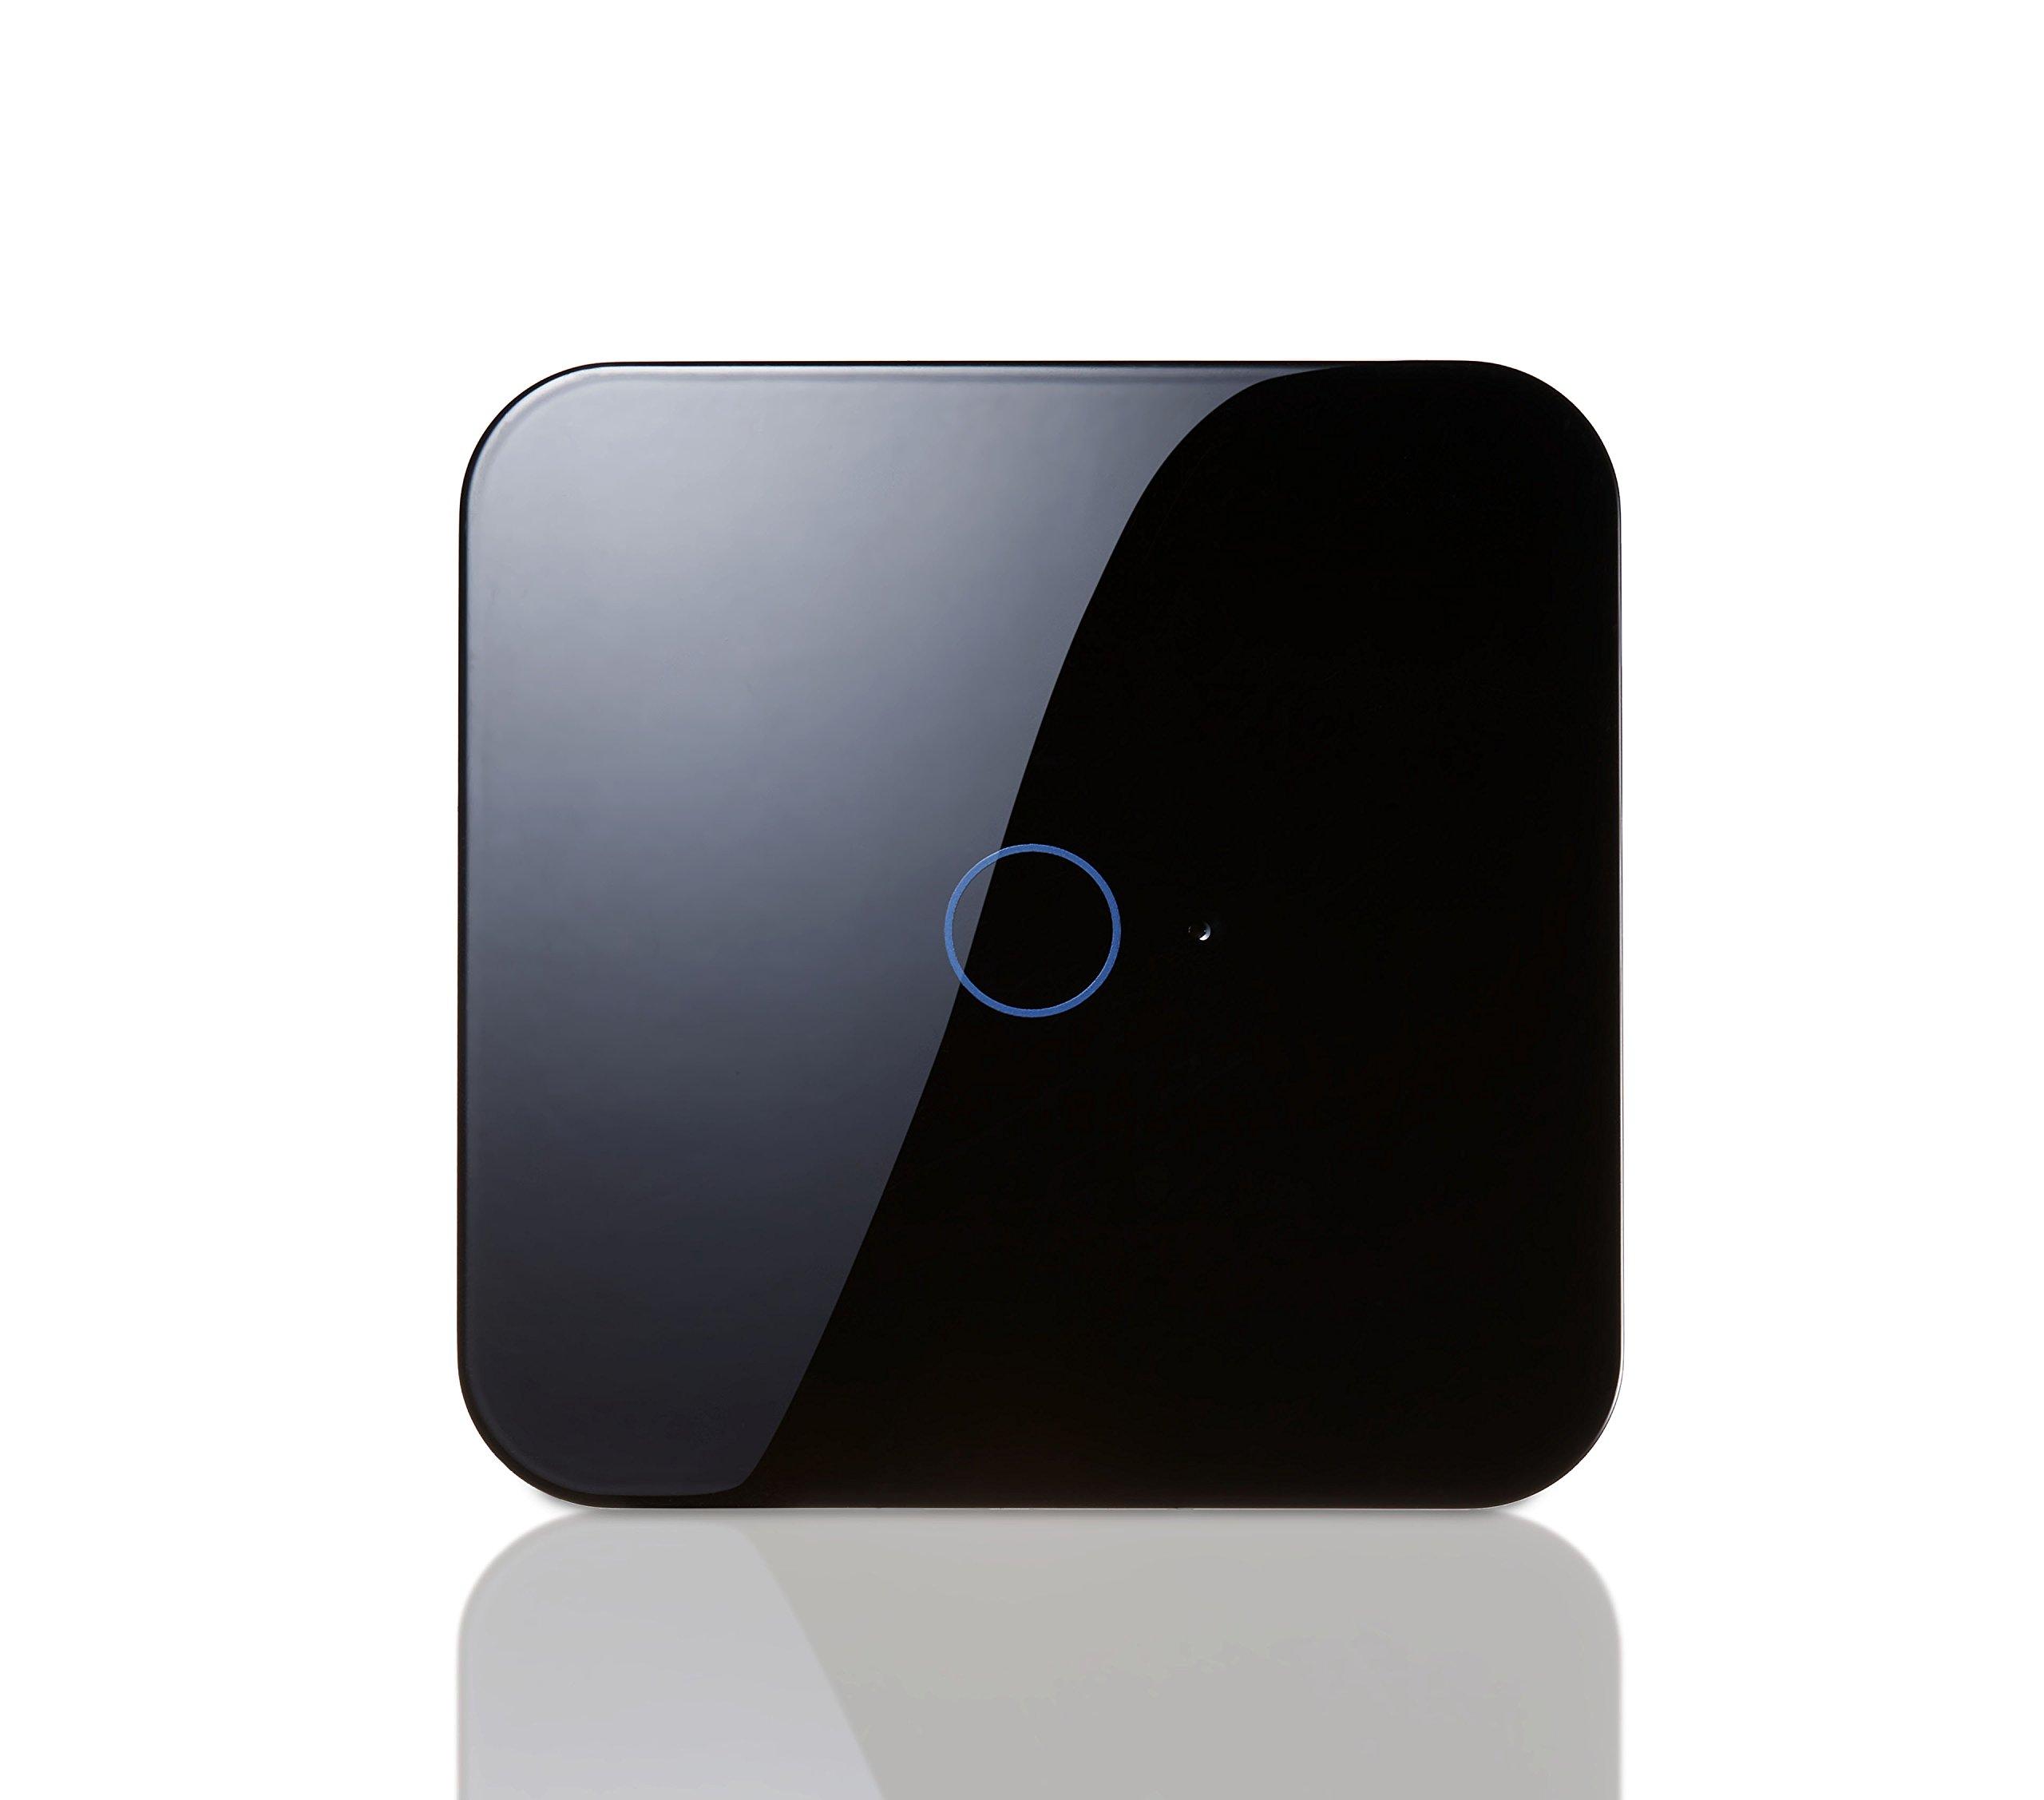 Naran PROTER S - 智能家居自动化的智能集线器 适用于 IFTTT Alexa